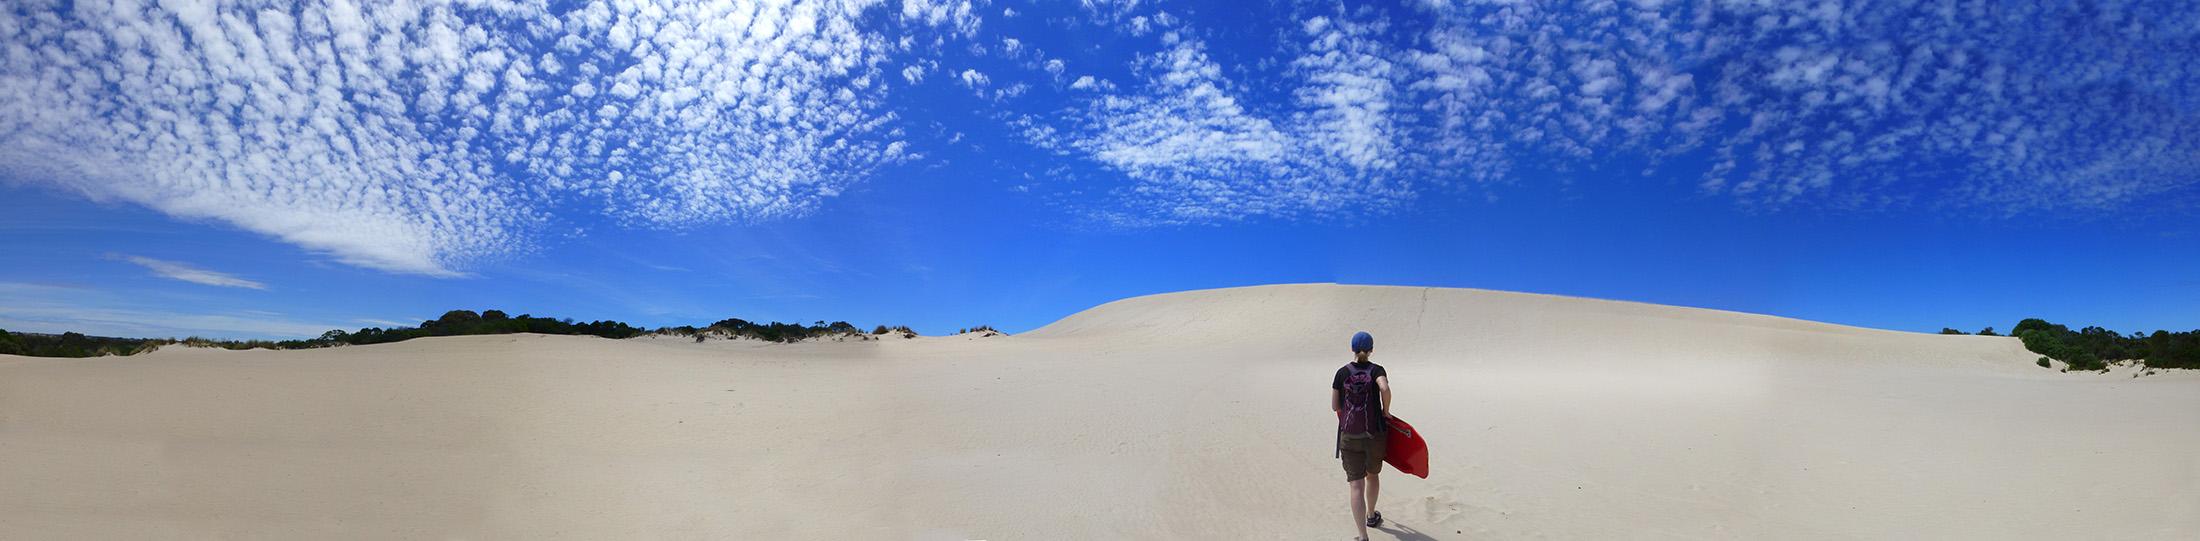 Climbing Little Sahara